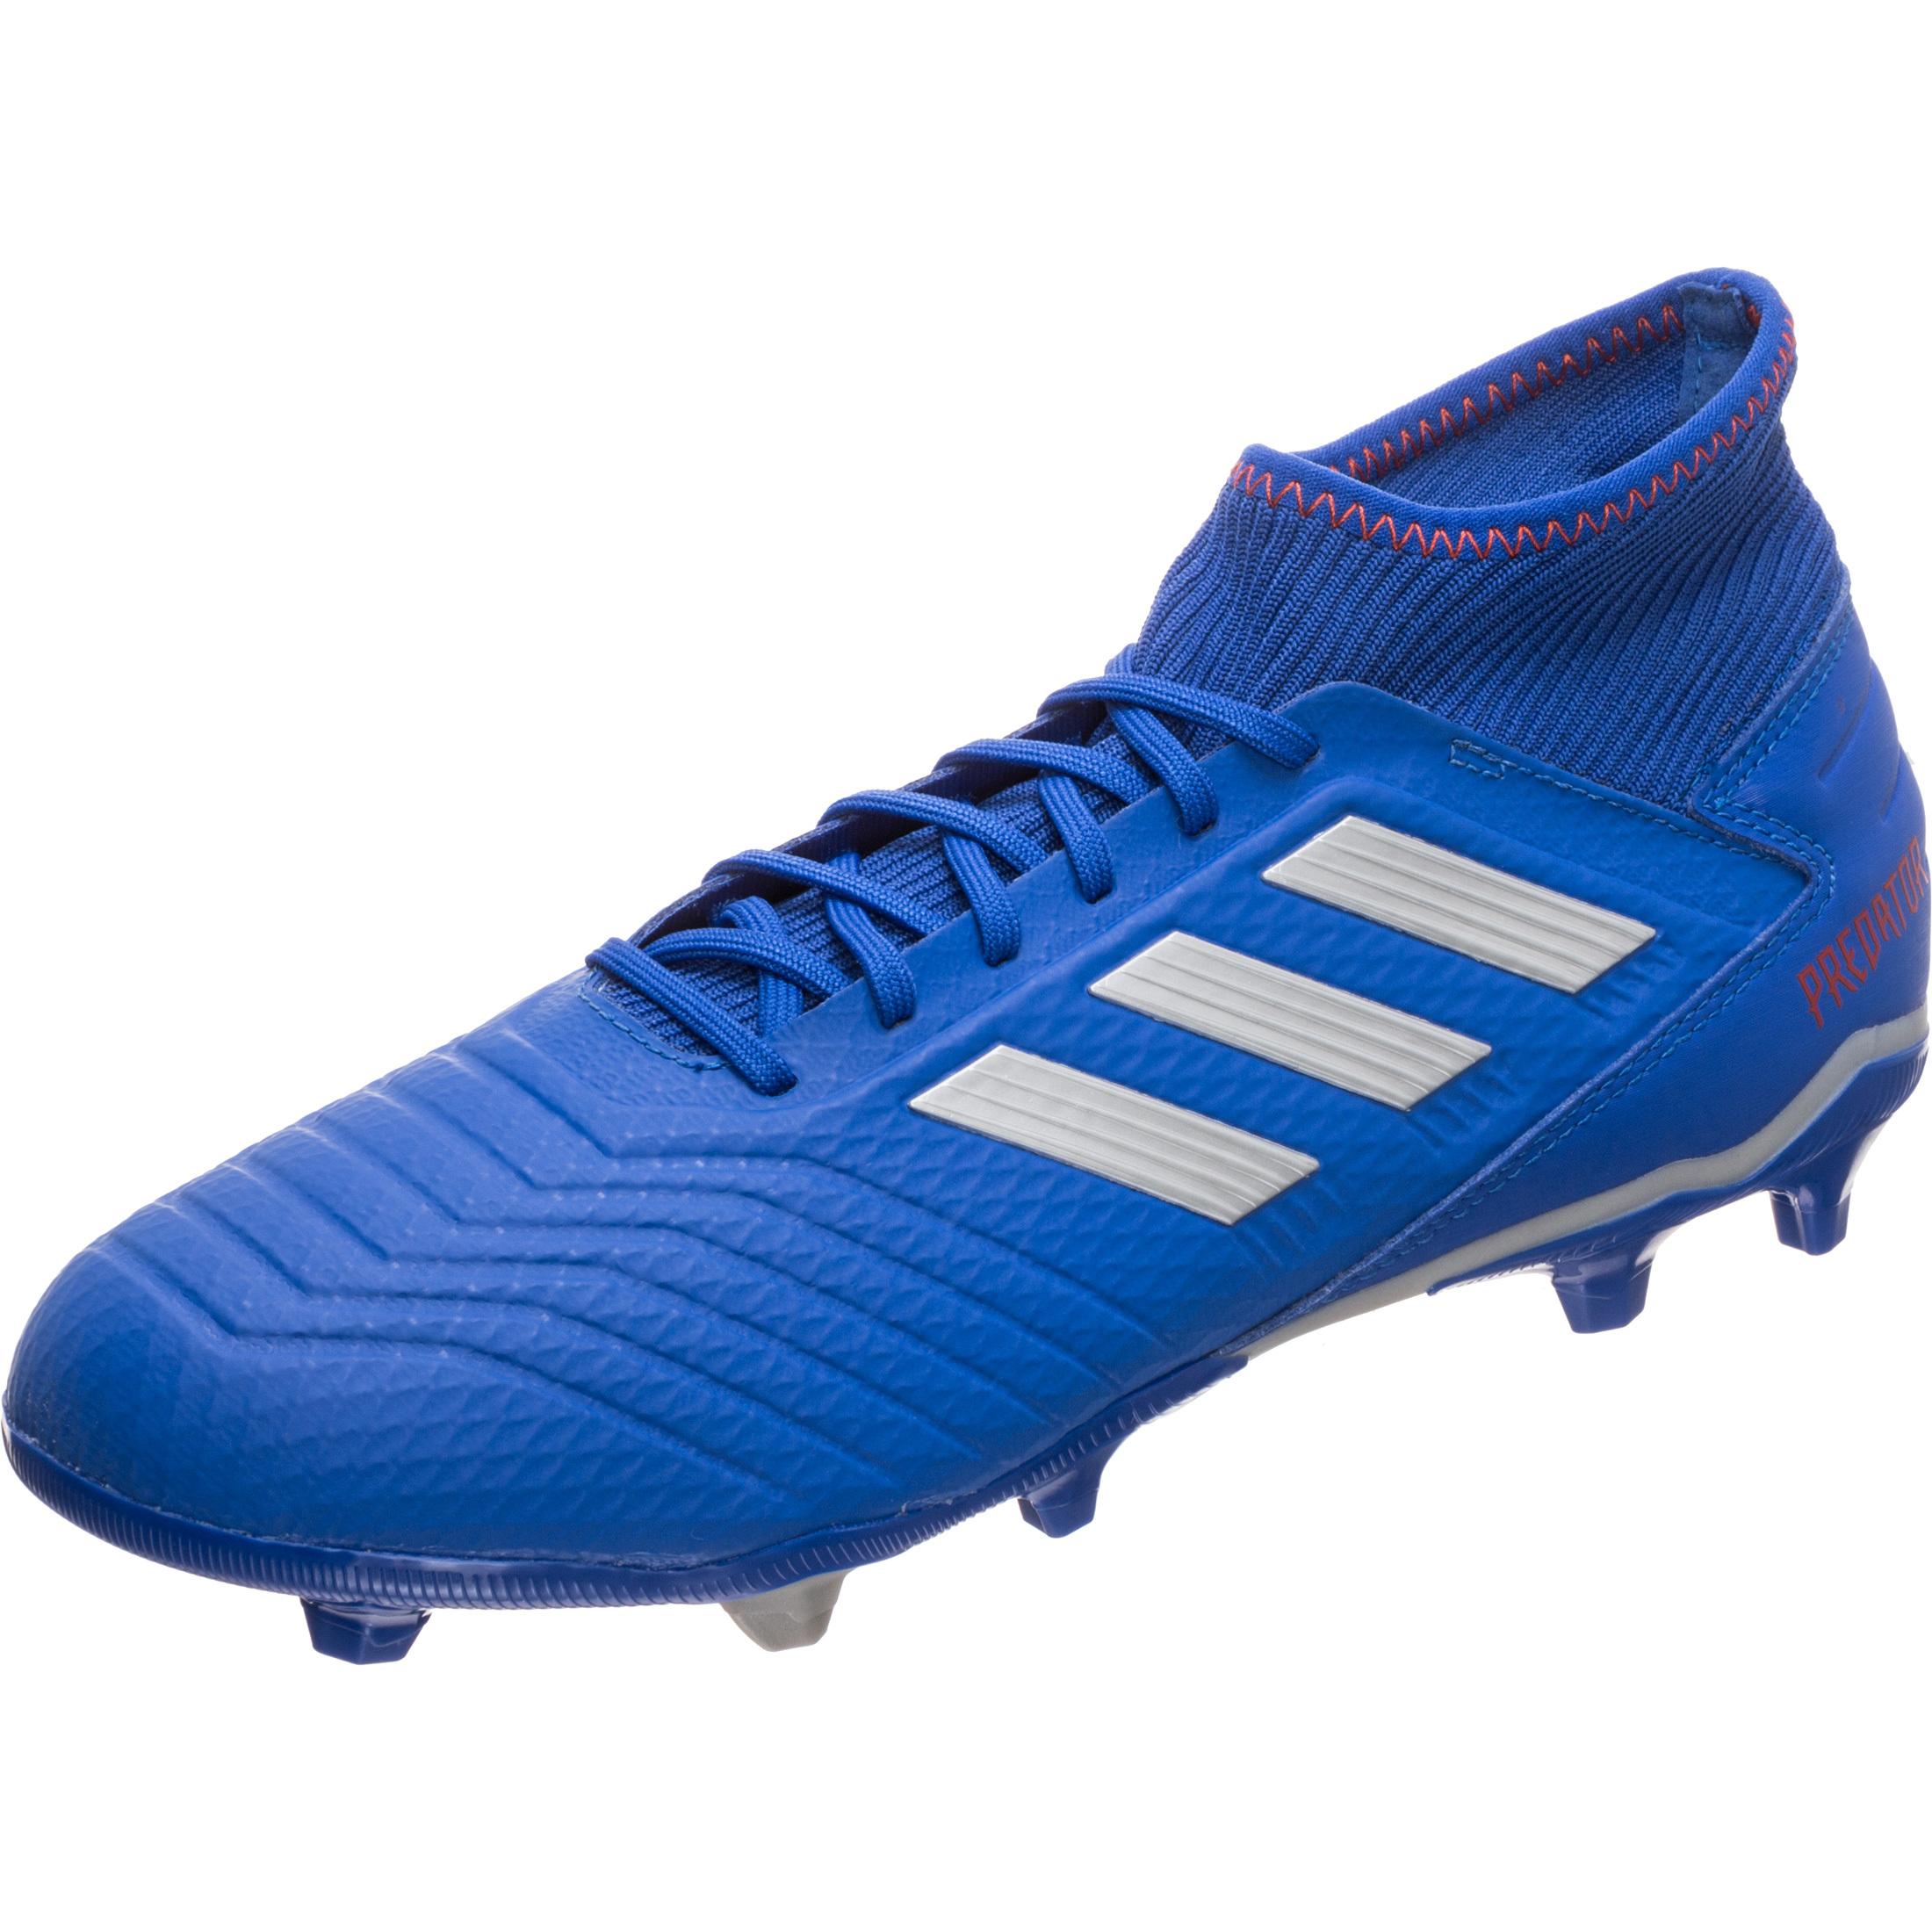 8911242482ba adidas Predator Football Boots | Compare Prices at FOOTY.COM